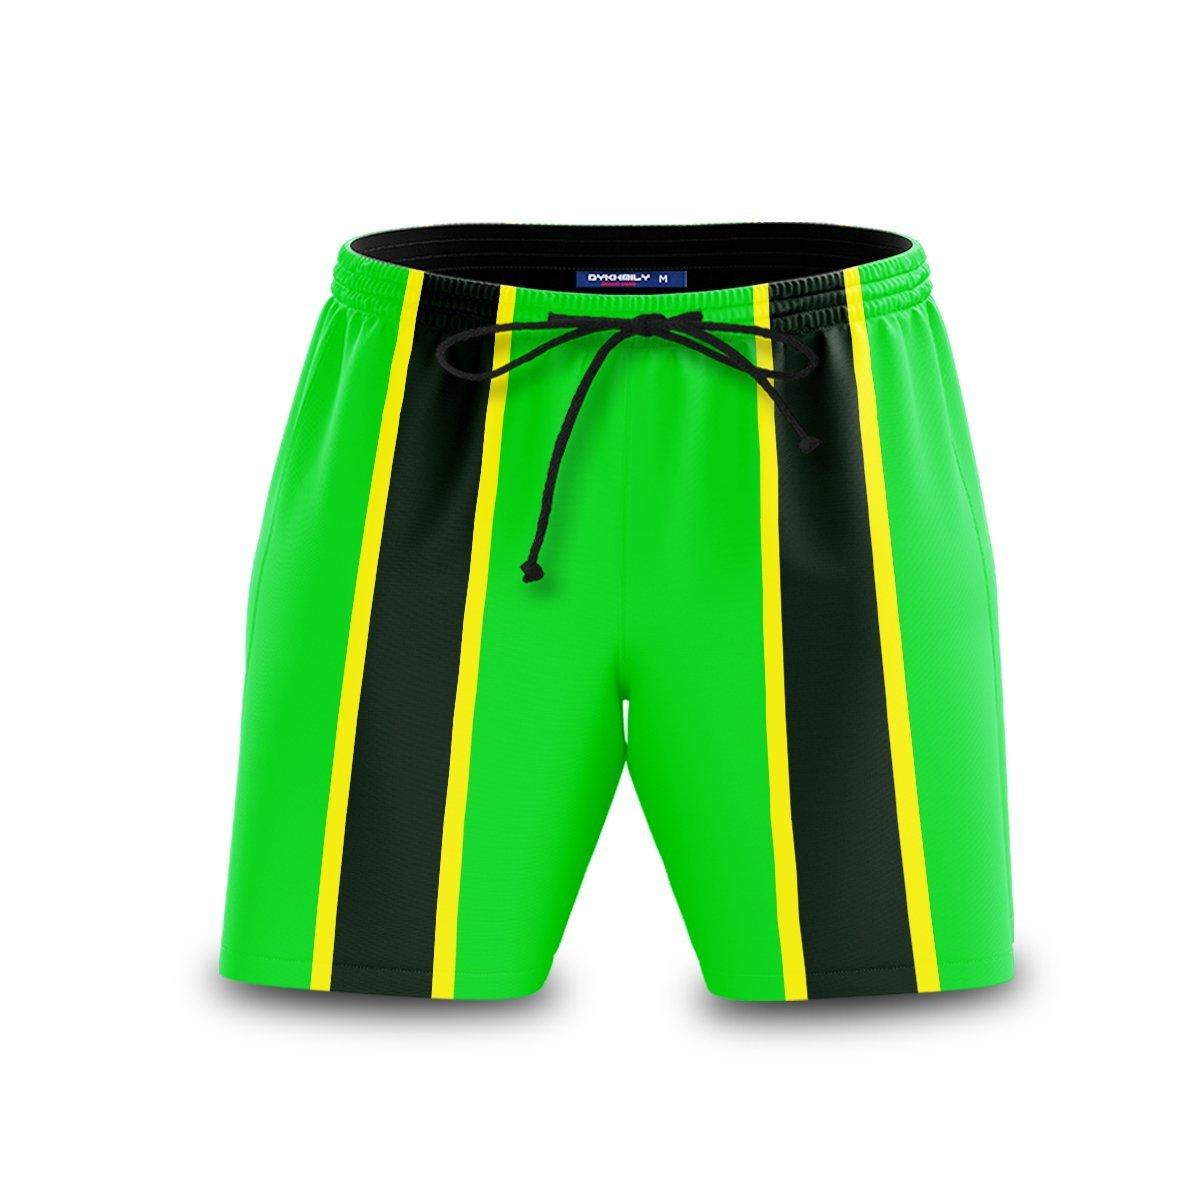 UA High Tsuyu Beach Shorts FDM3107 S Official Anime Swimsuit Merch